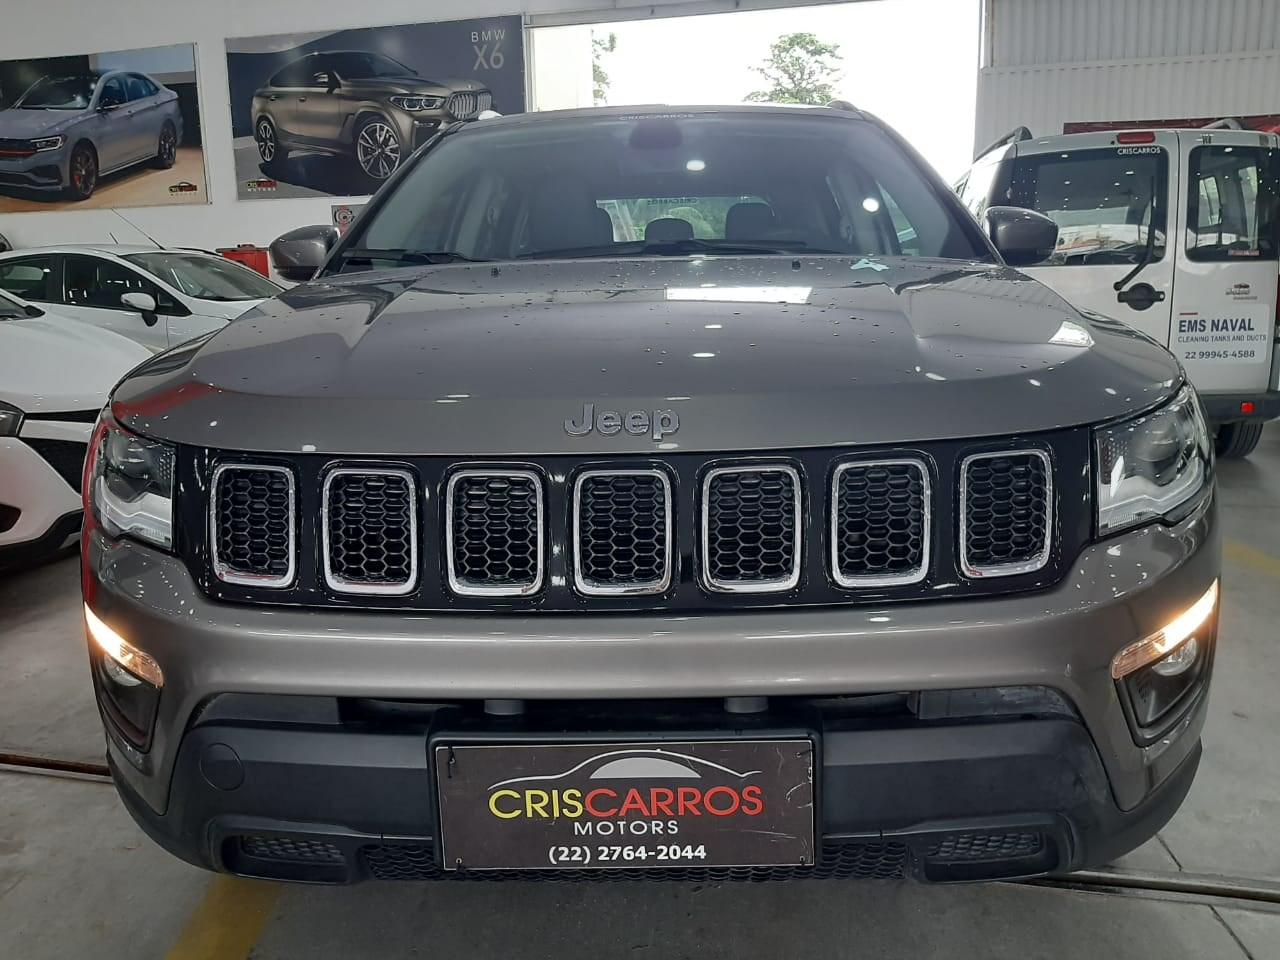 //www.autoline.com.br/carro/jeep/compass-20-longitude-16v-diesel-4p-automatico-4x4-tur/2019/rio-das-ostras-rj/13834761